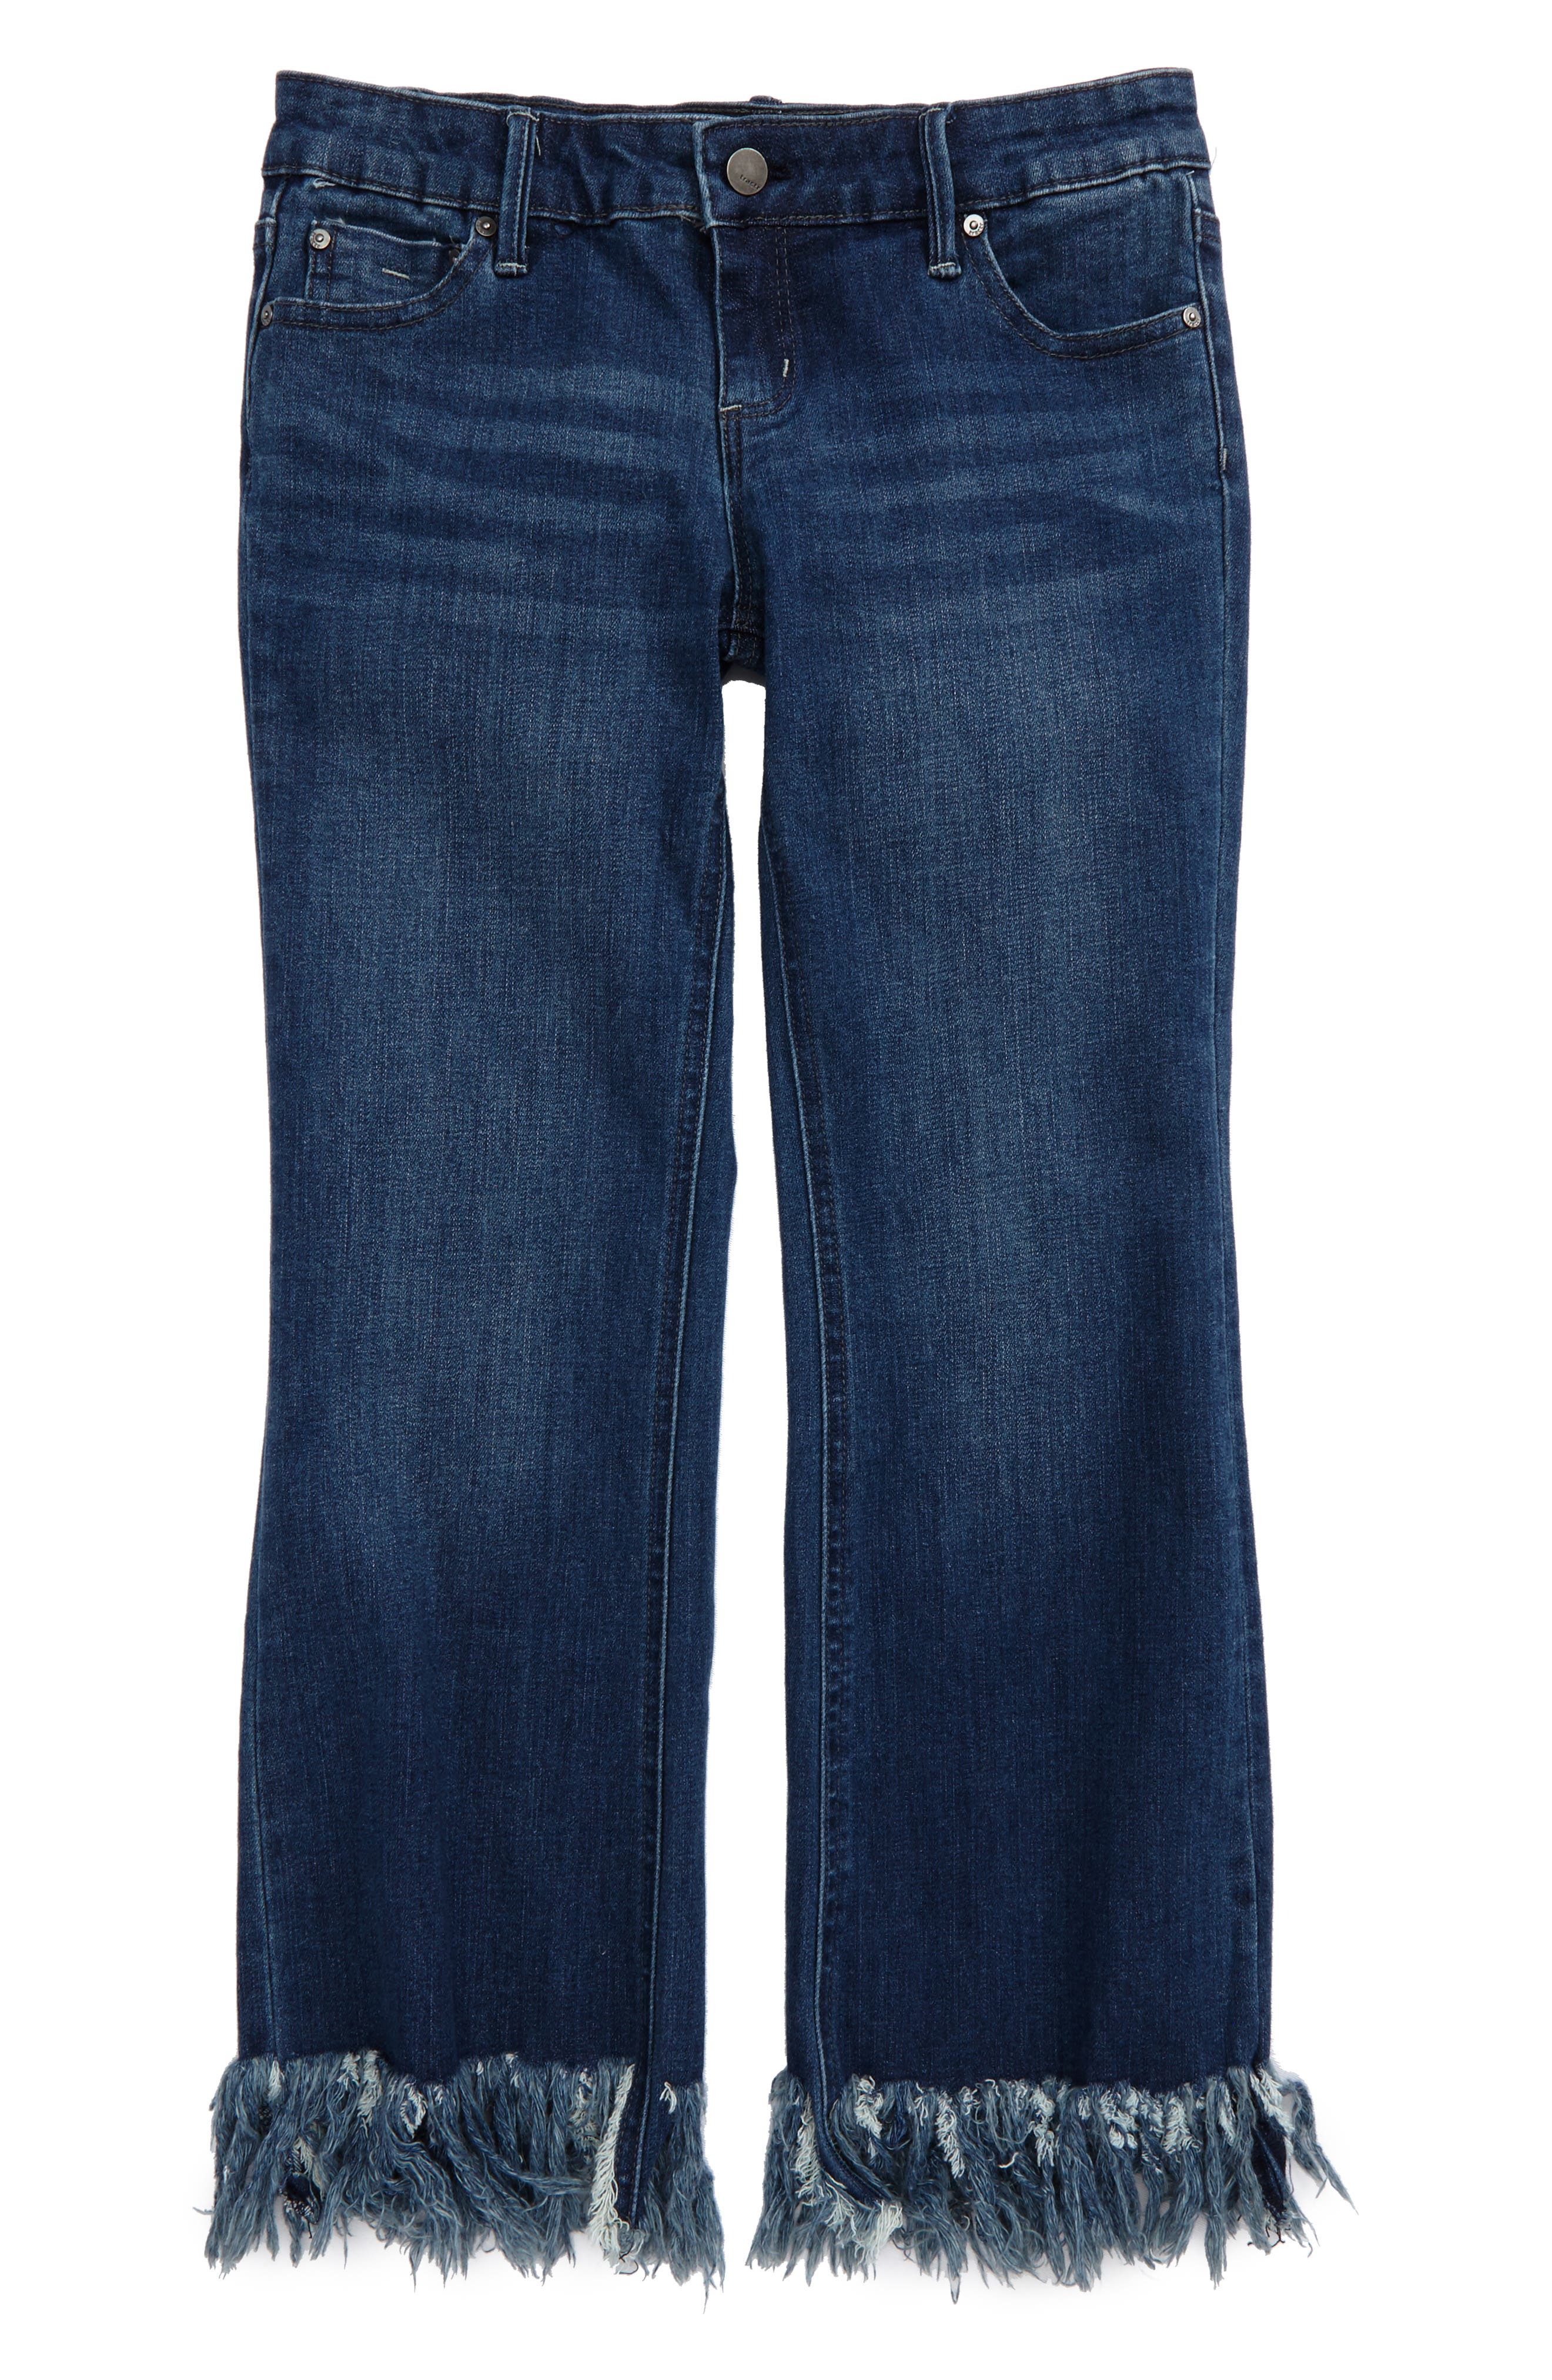 Alternate Image 1 Selected - Tractr Frayed Hem Crop Jeans (Big Girls)